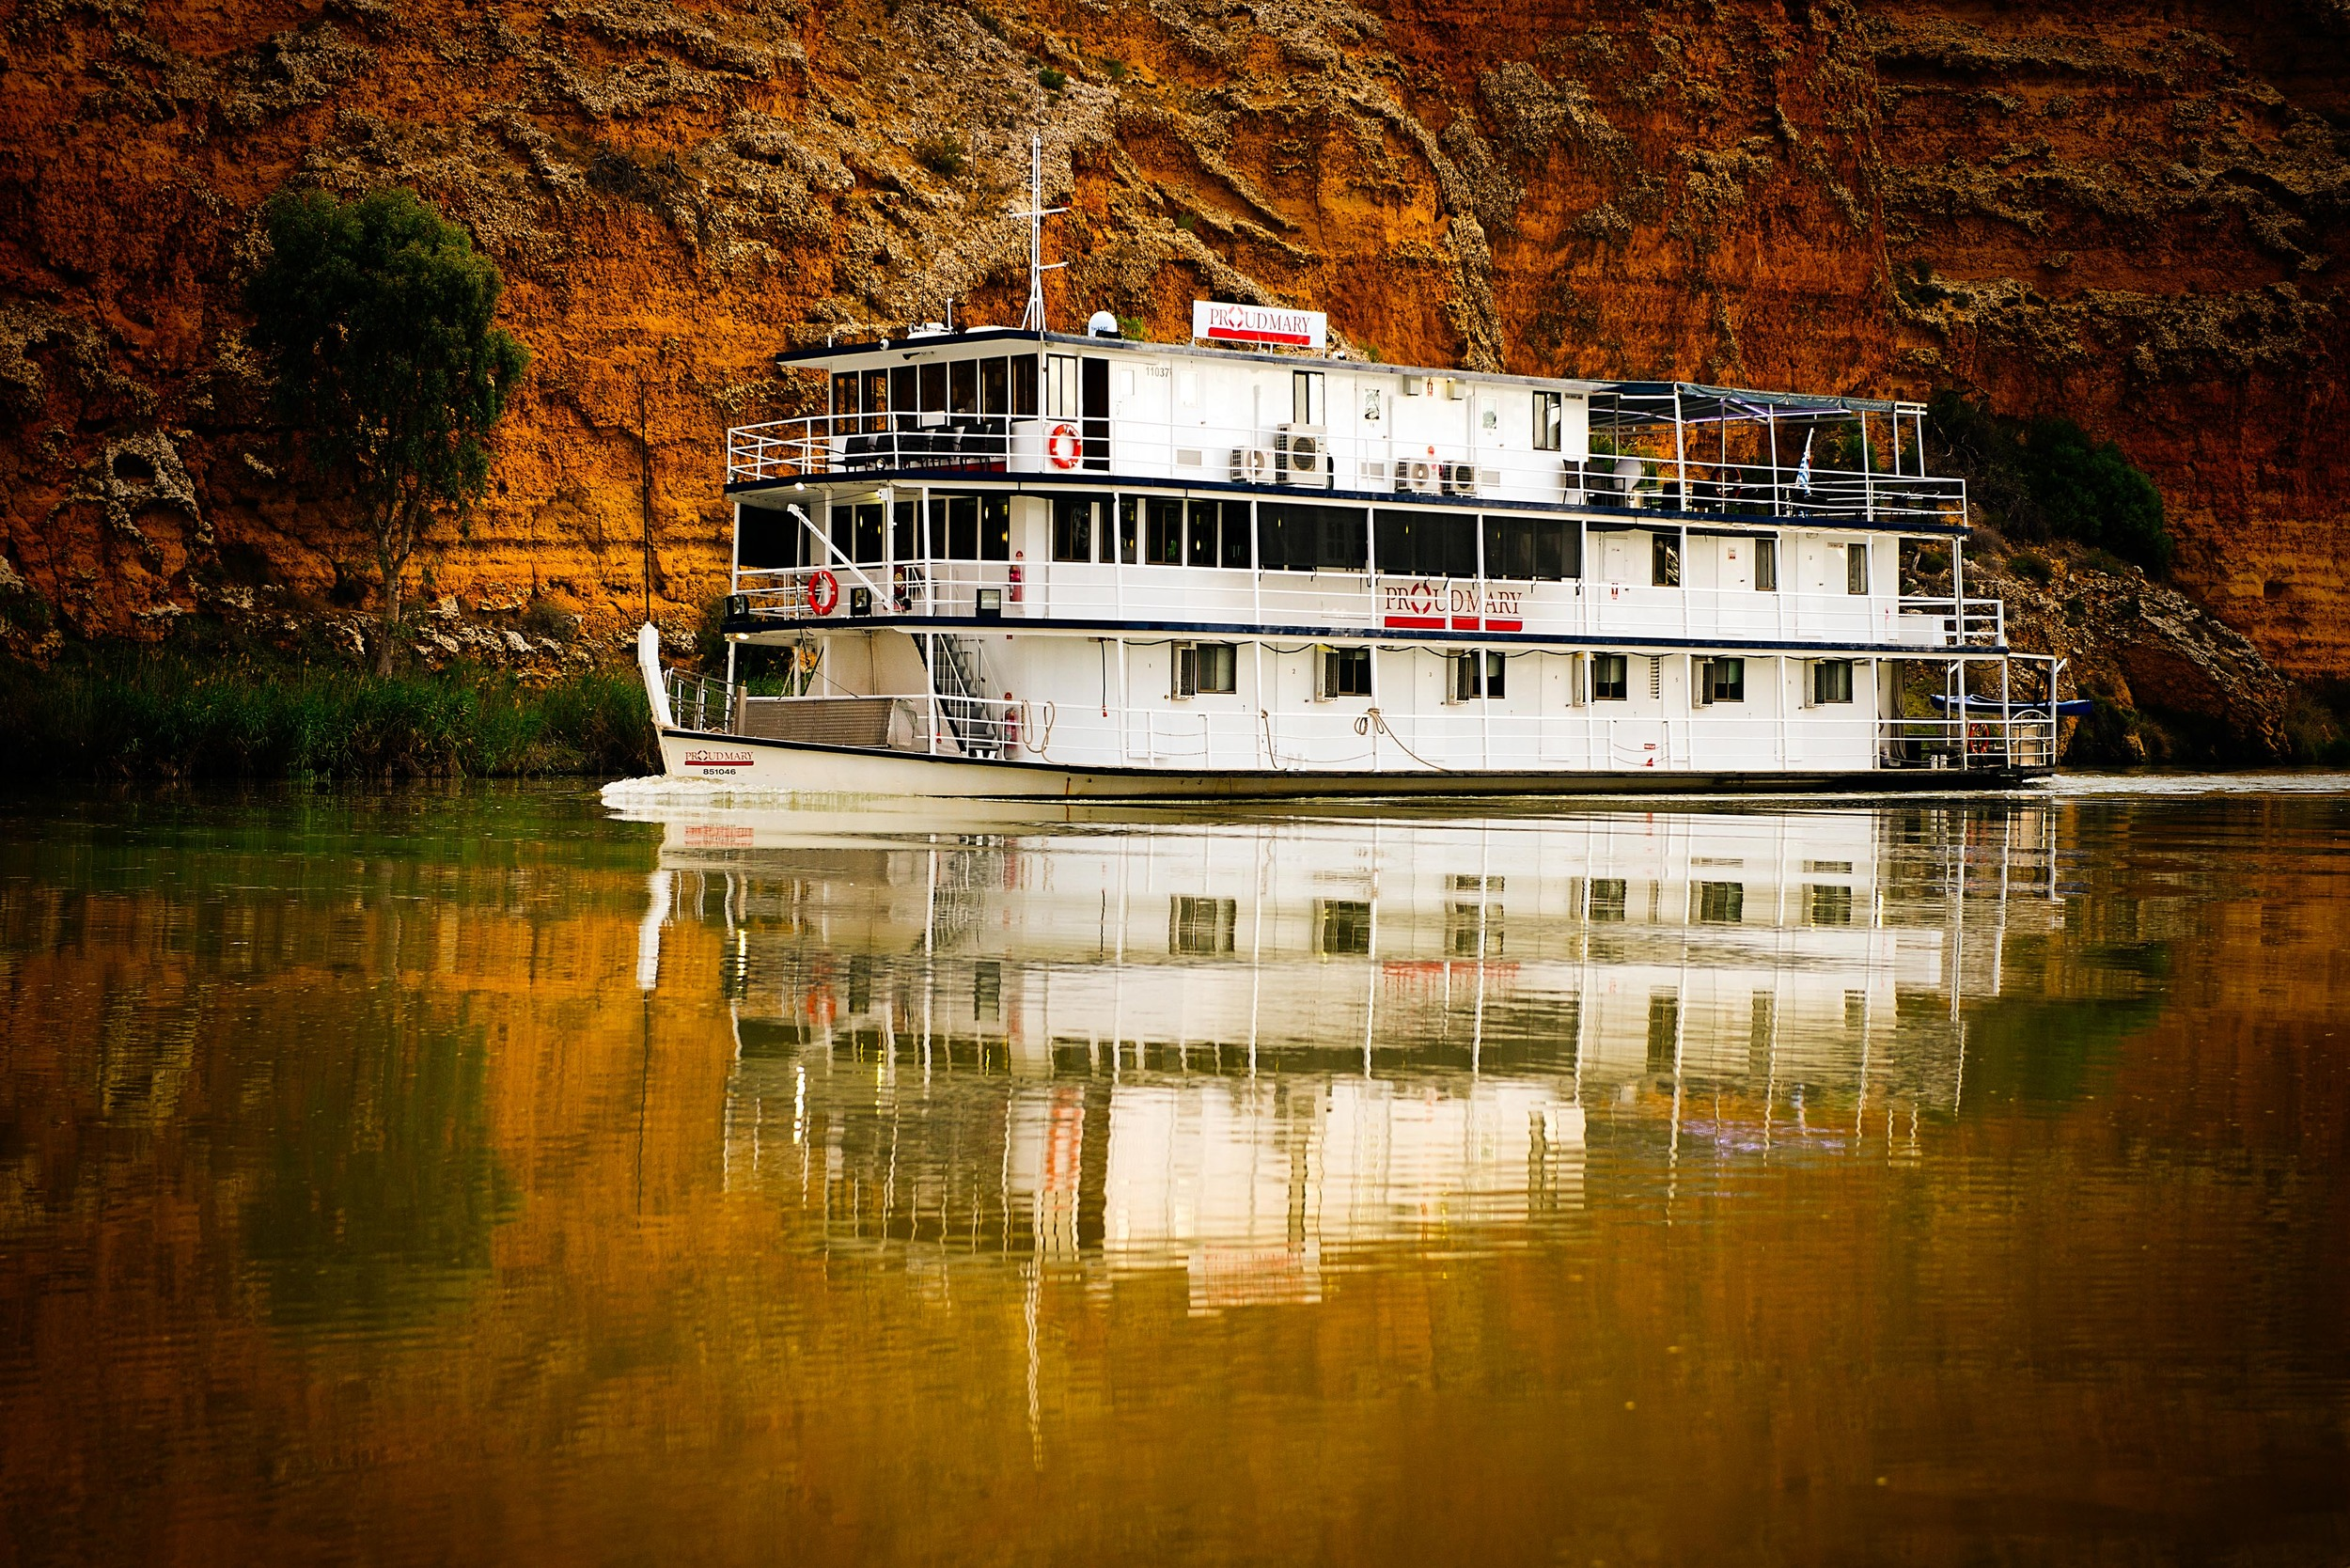 4 night murray river cruise captain cook cruises - HD2500×1668